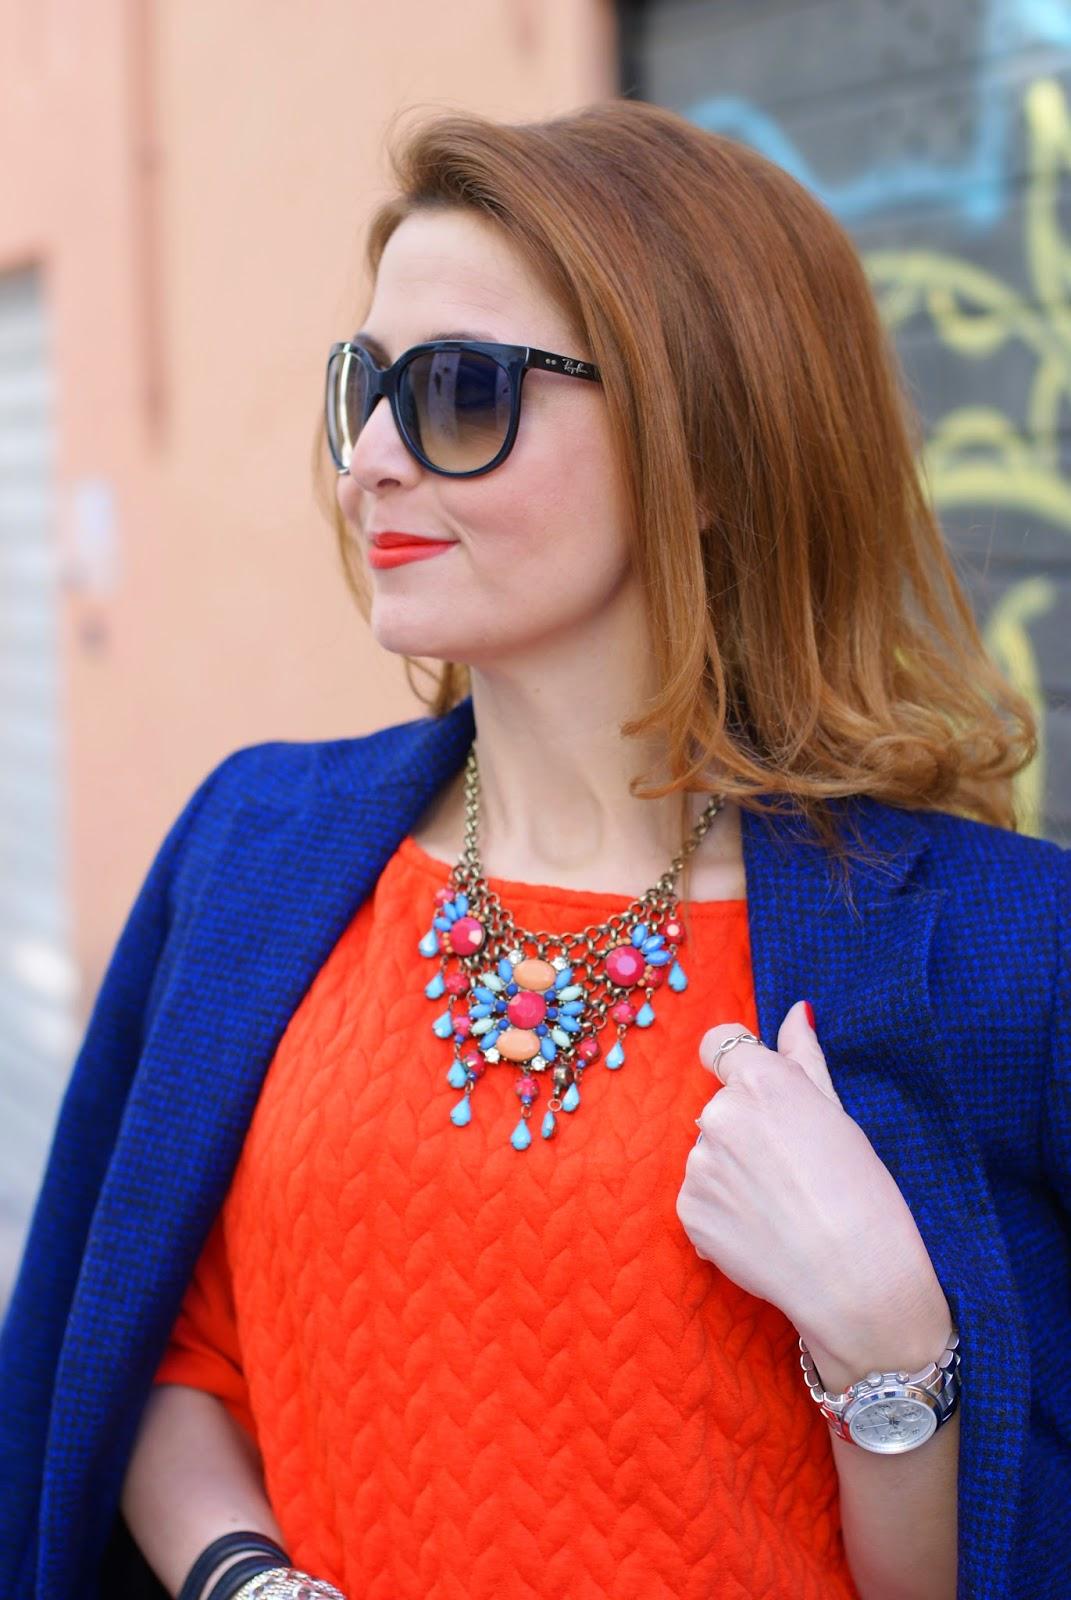 Blumarine leather fringed skirt, fringe hemline skirt, ray-ban cat eye sunglasses, Miu Miu black tote, bijou brigitte necklace, Fashion and Cookies fashion blog, fashion blogger